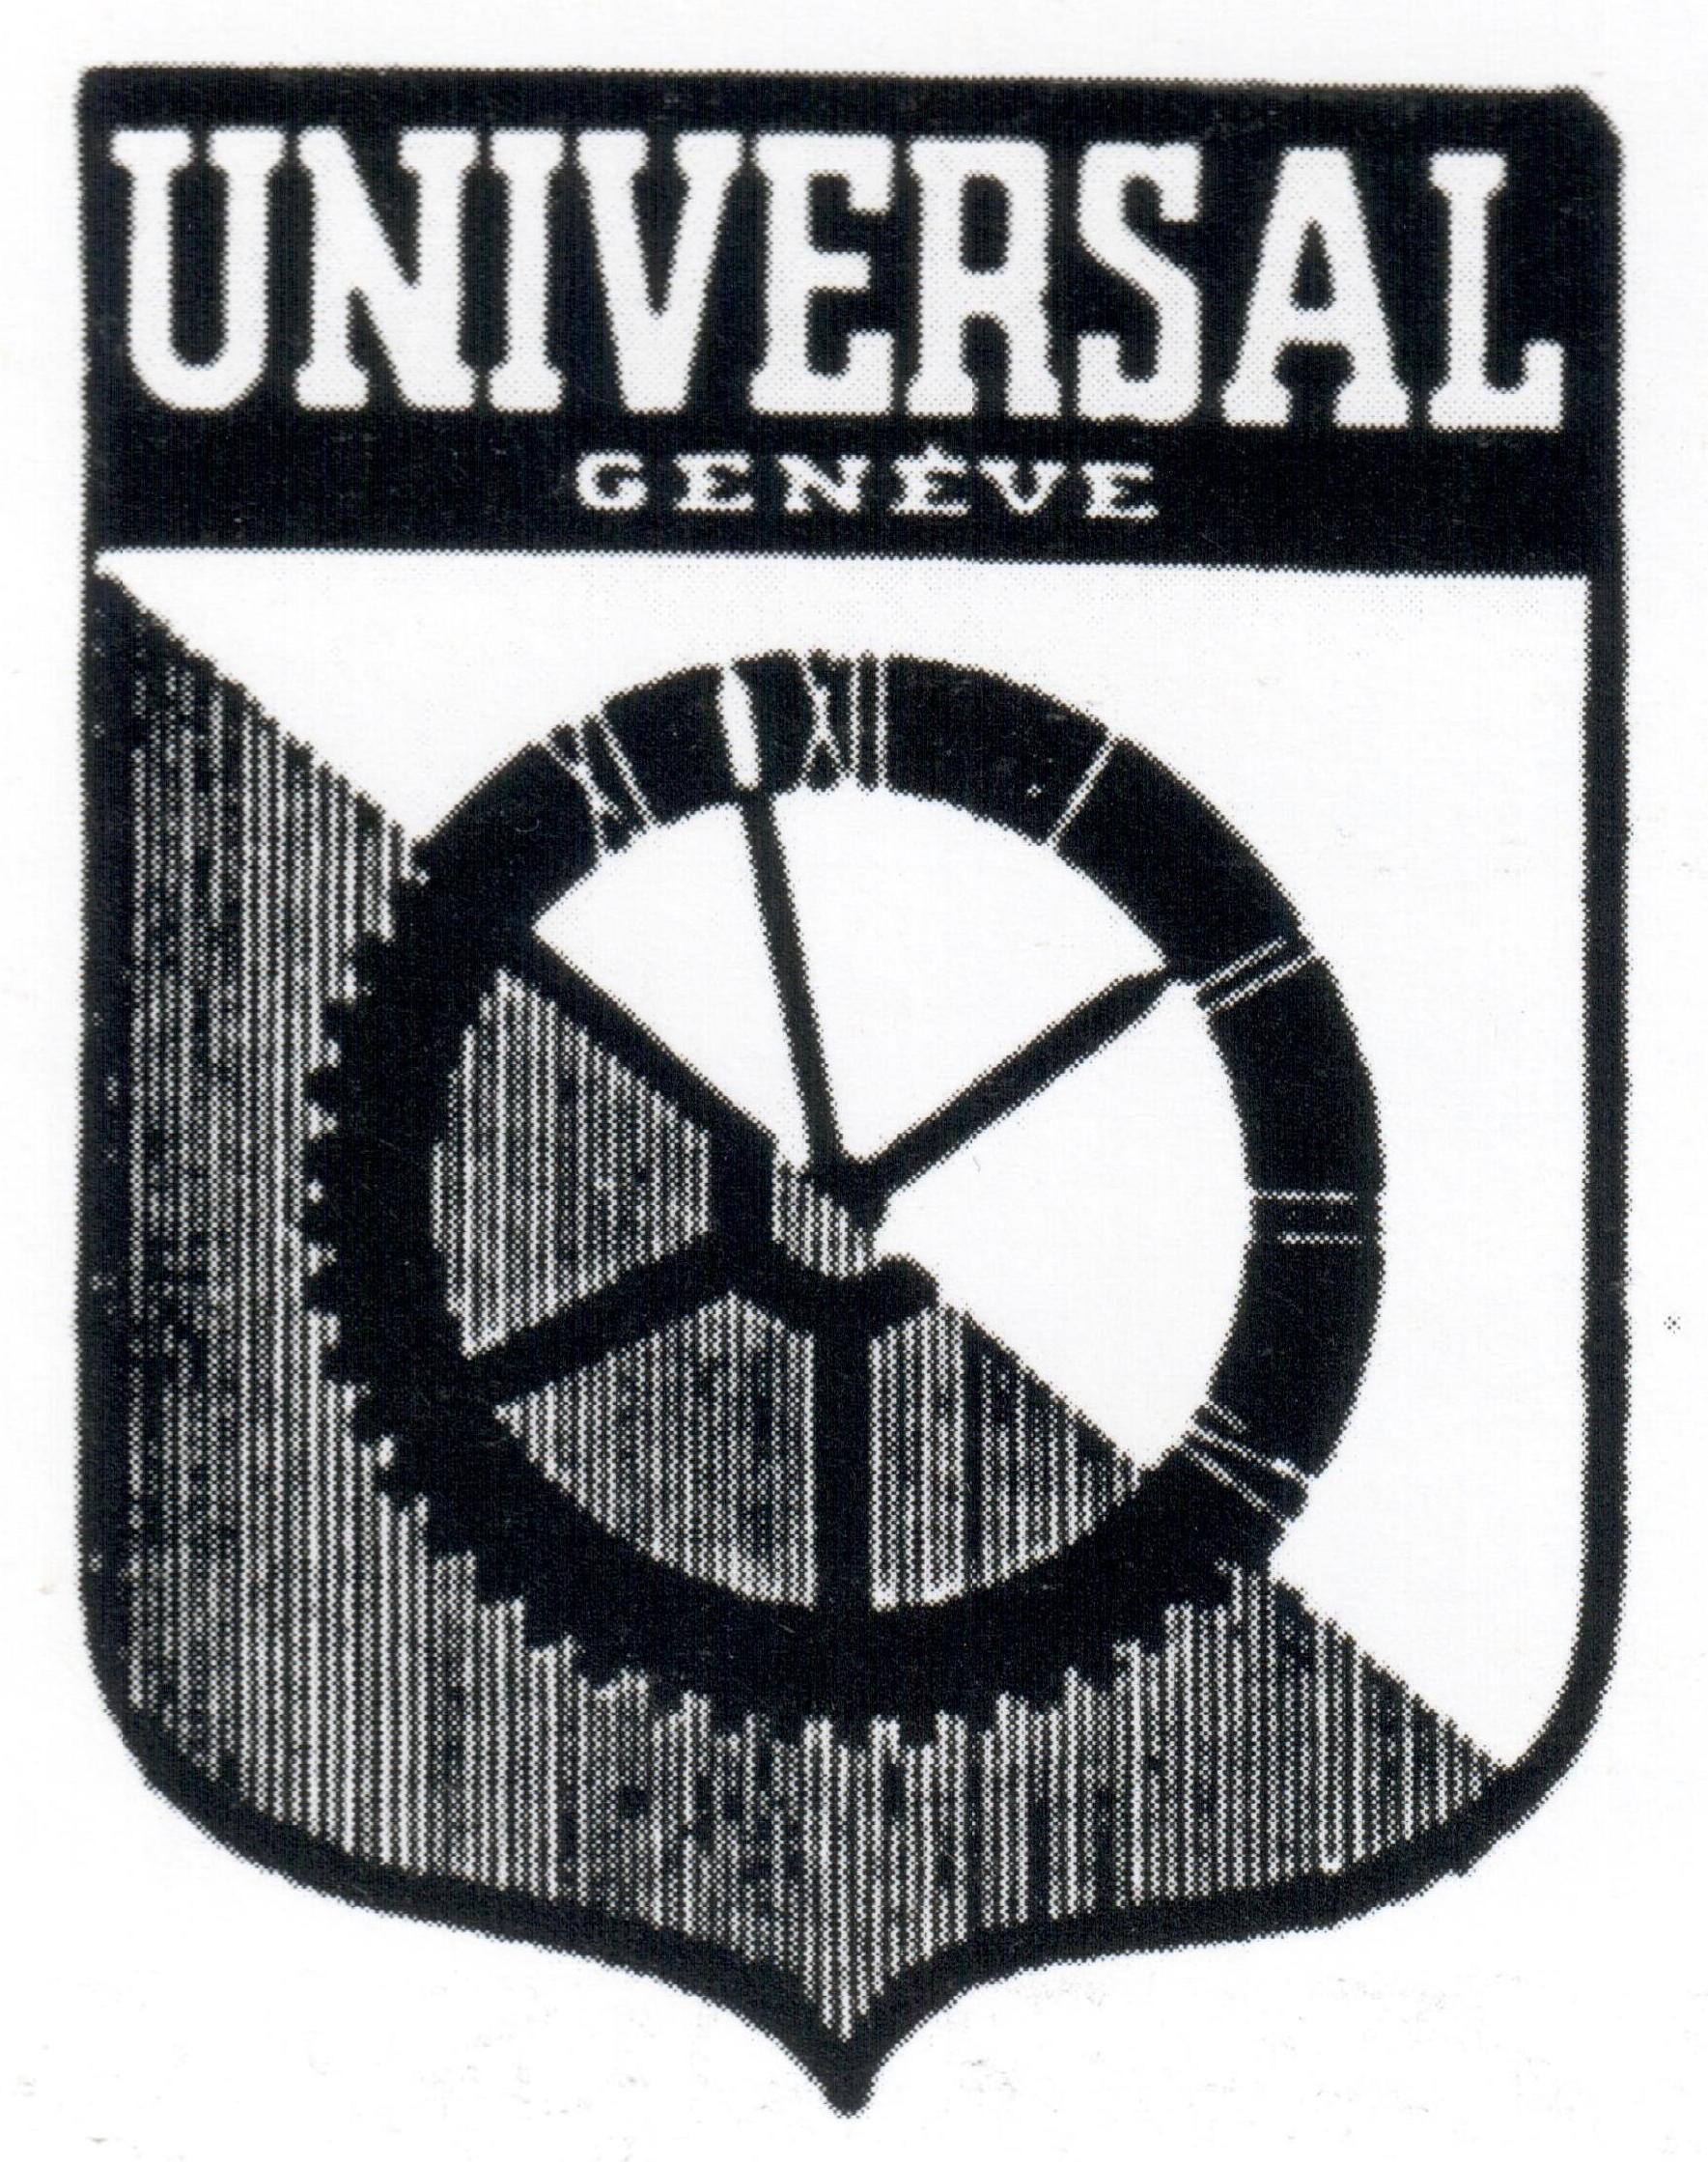 The new UG shielded logo